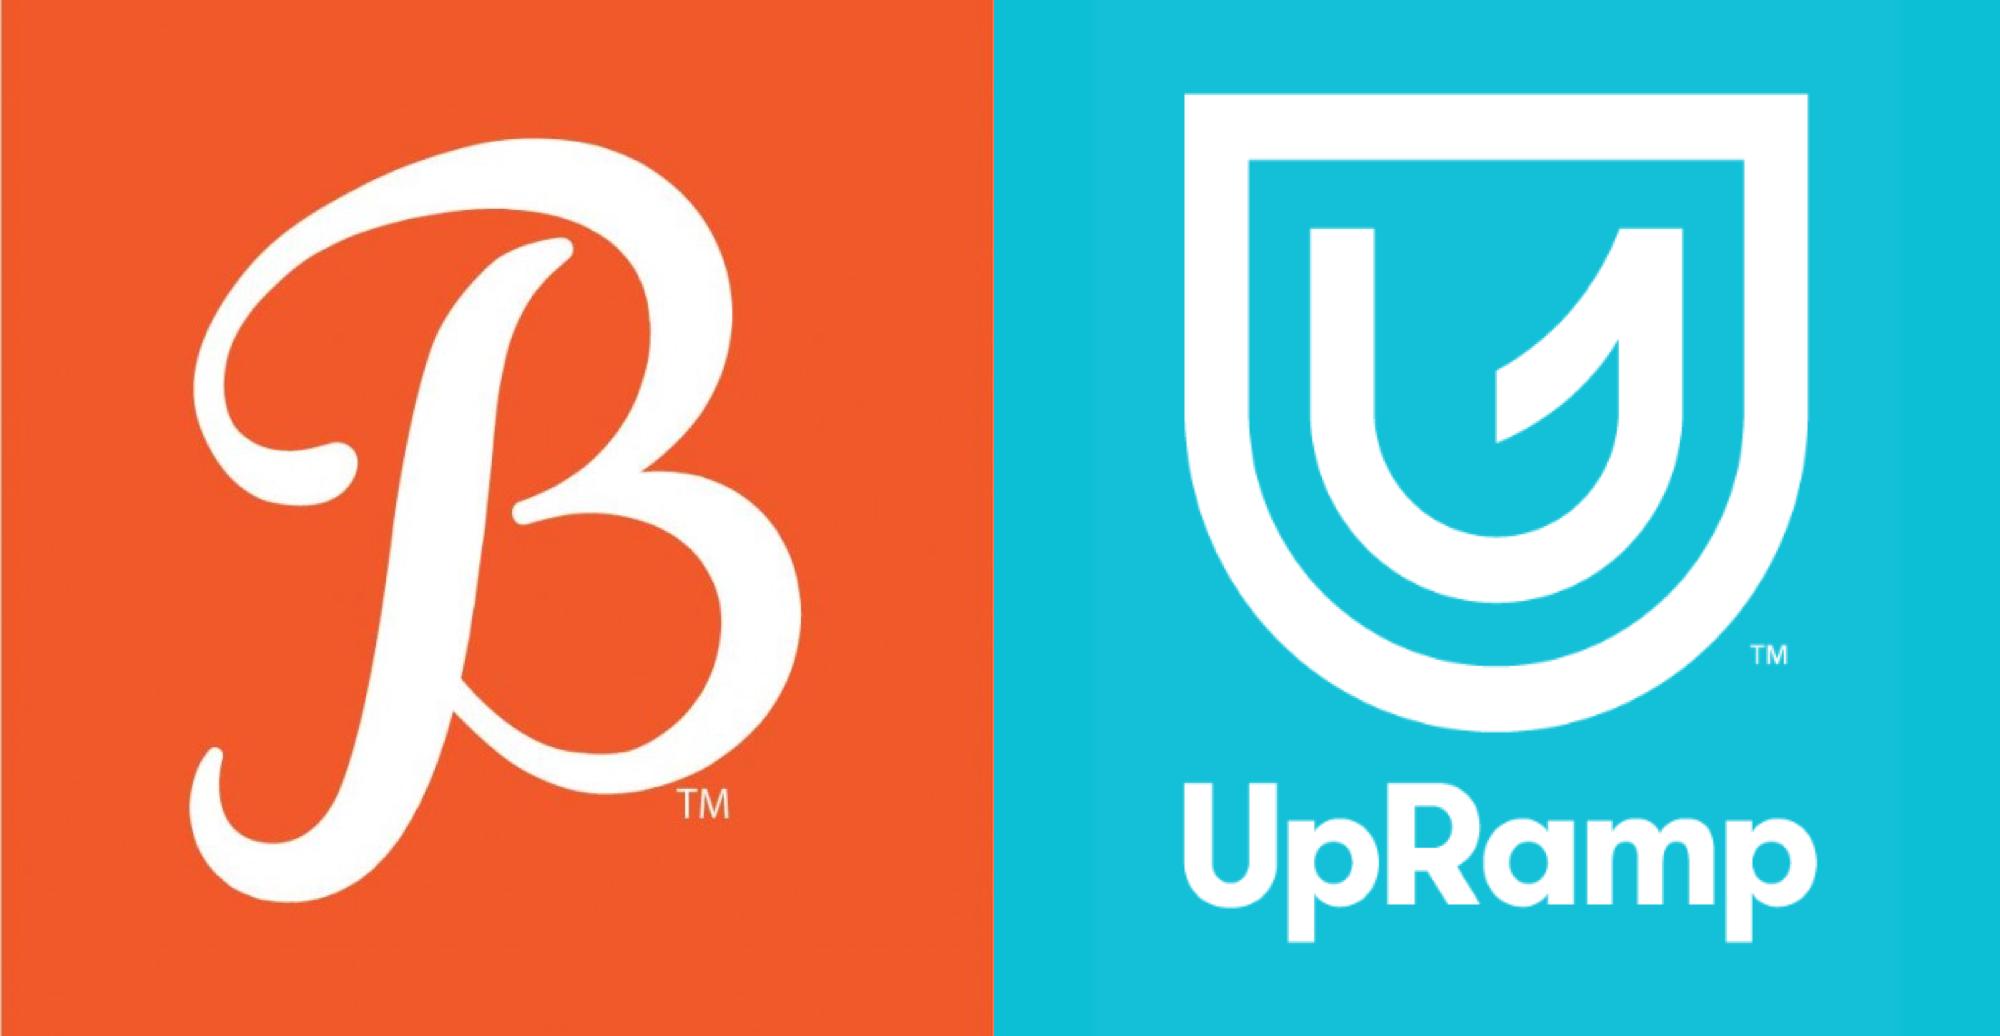 Boomtown_UpRamp-bg.png